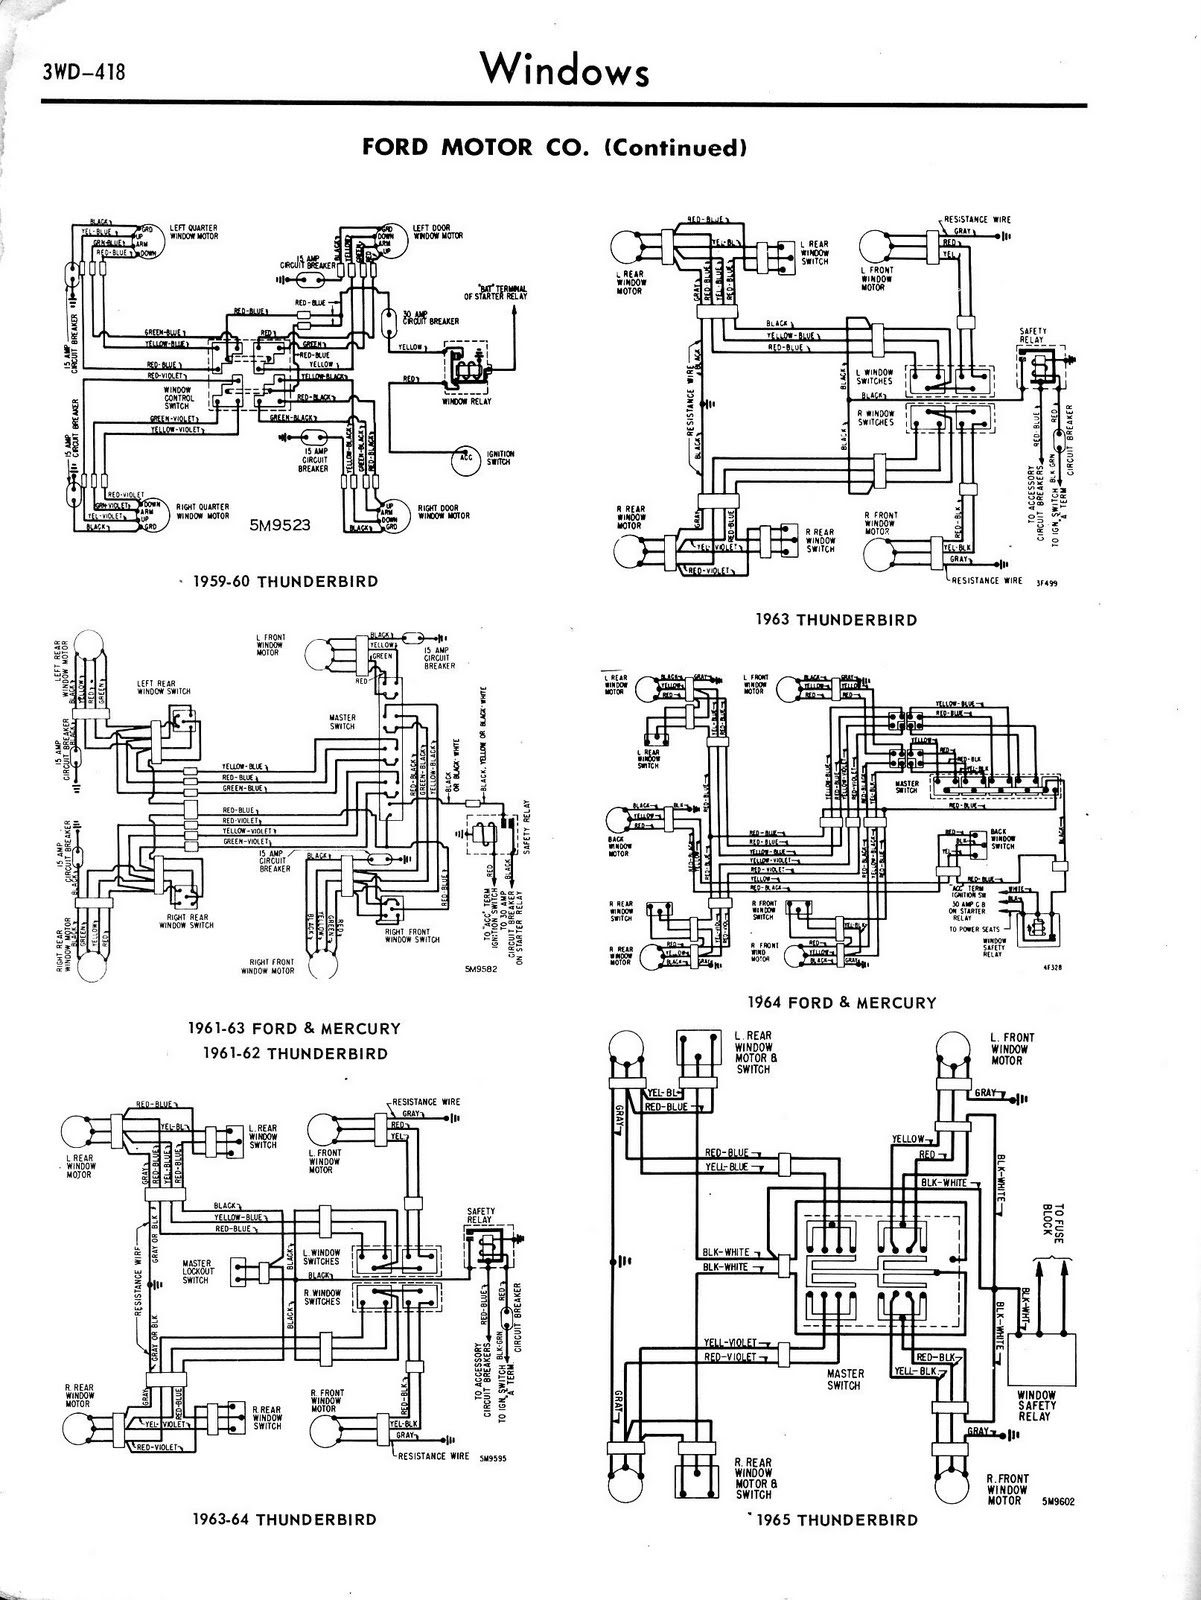 88 thunderbird fuse box wiring diagram tutorial 1969 thunderbird wiring  diagram 1965 thunderbird window wiring diagram